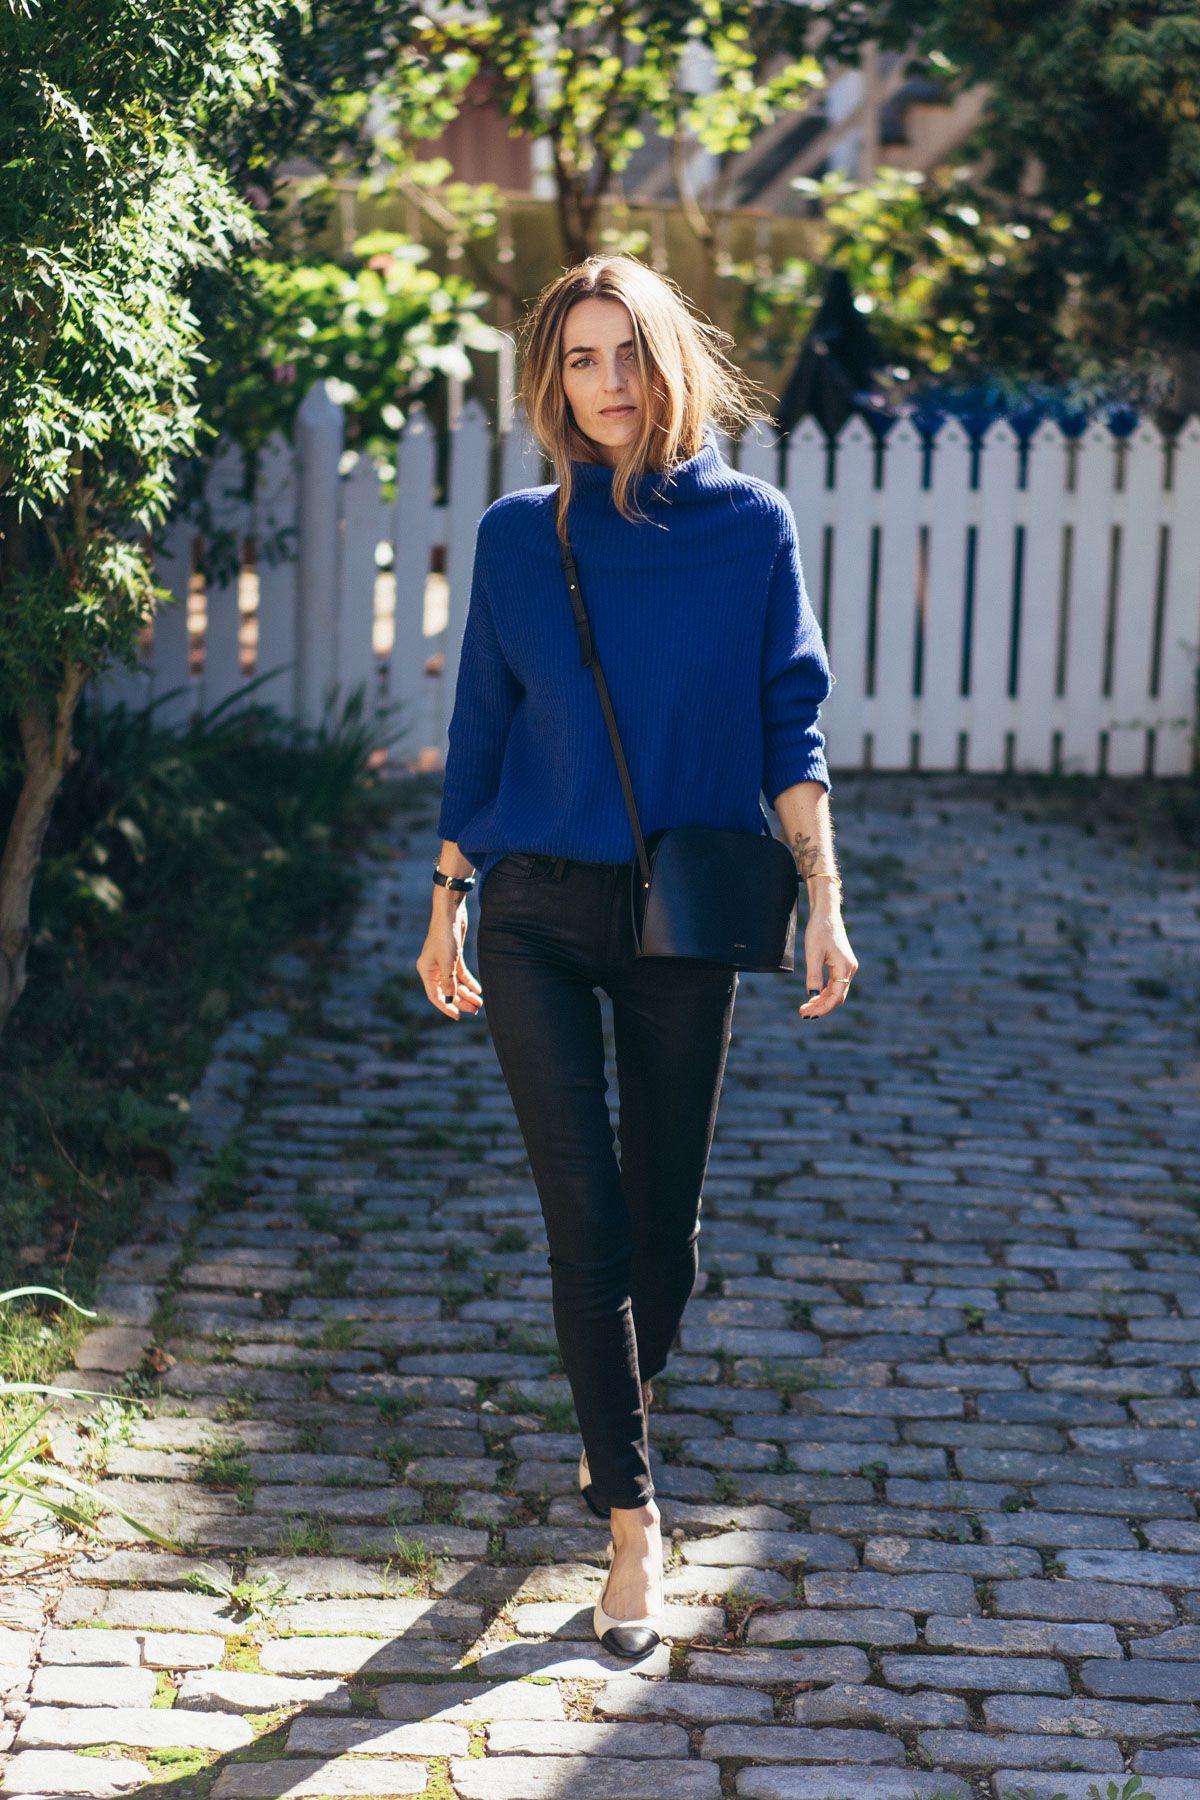 My Favorite Cashmere Sweaters | Fashion, Autumn fashion